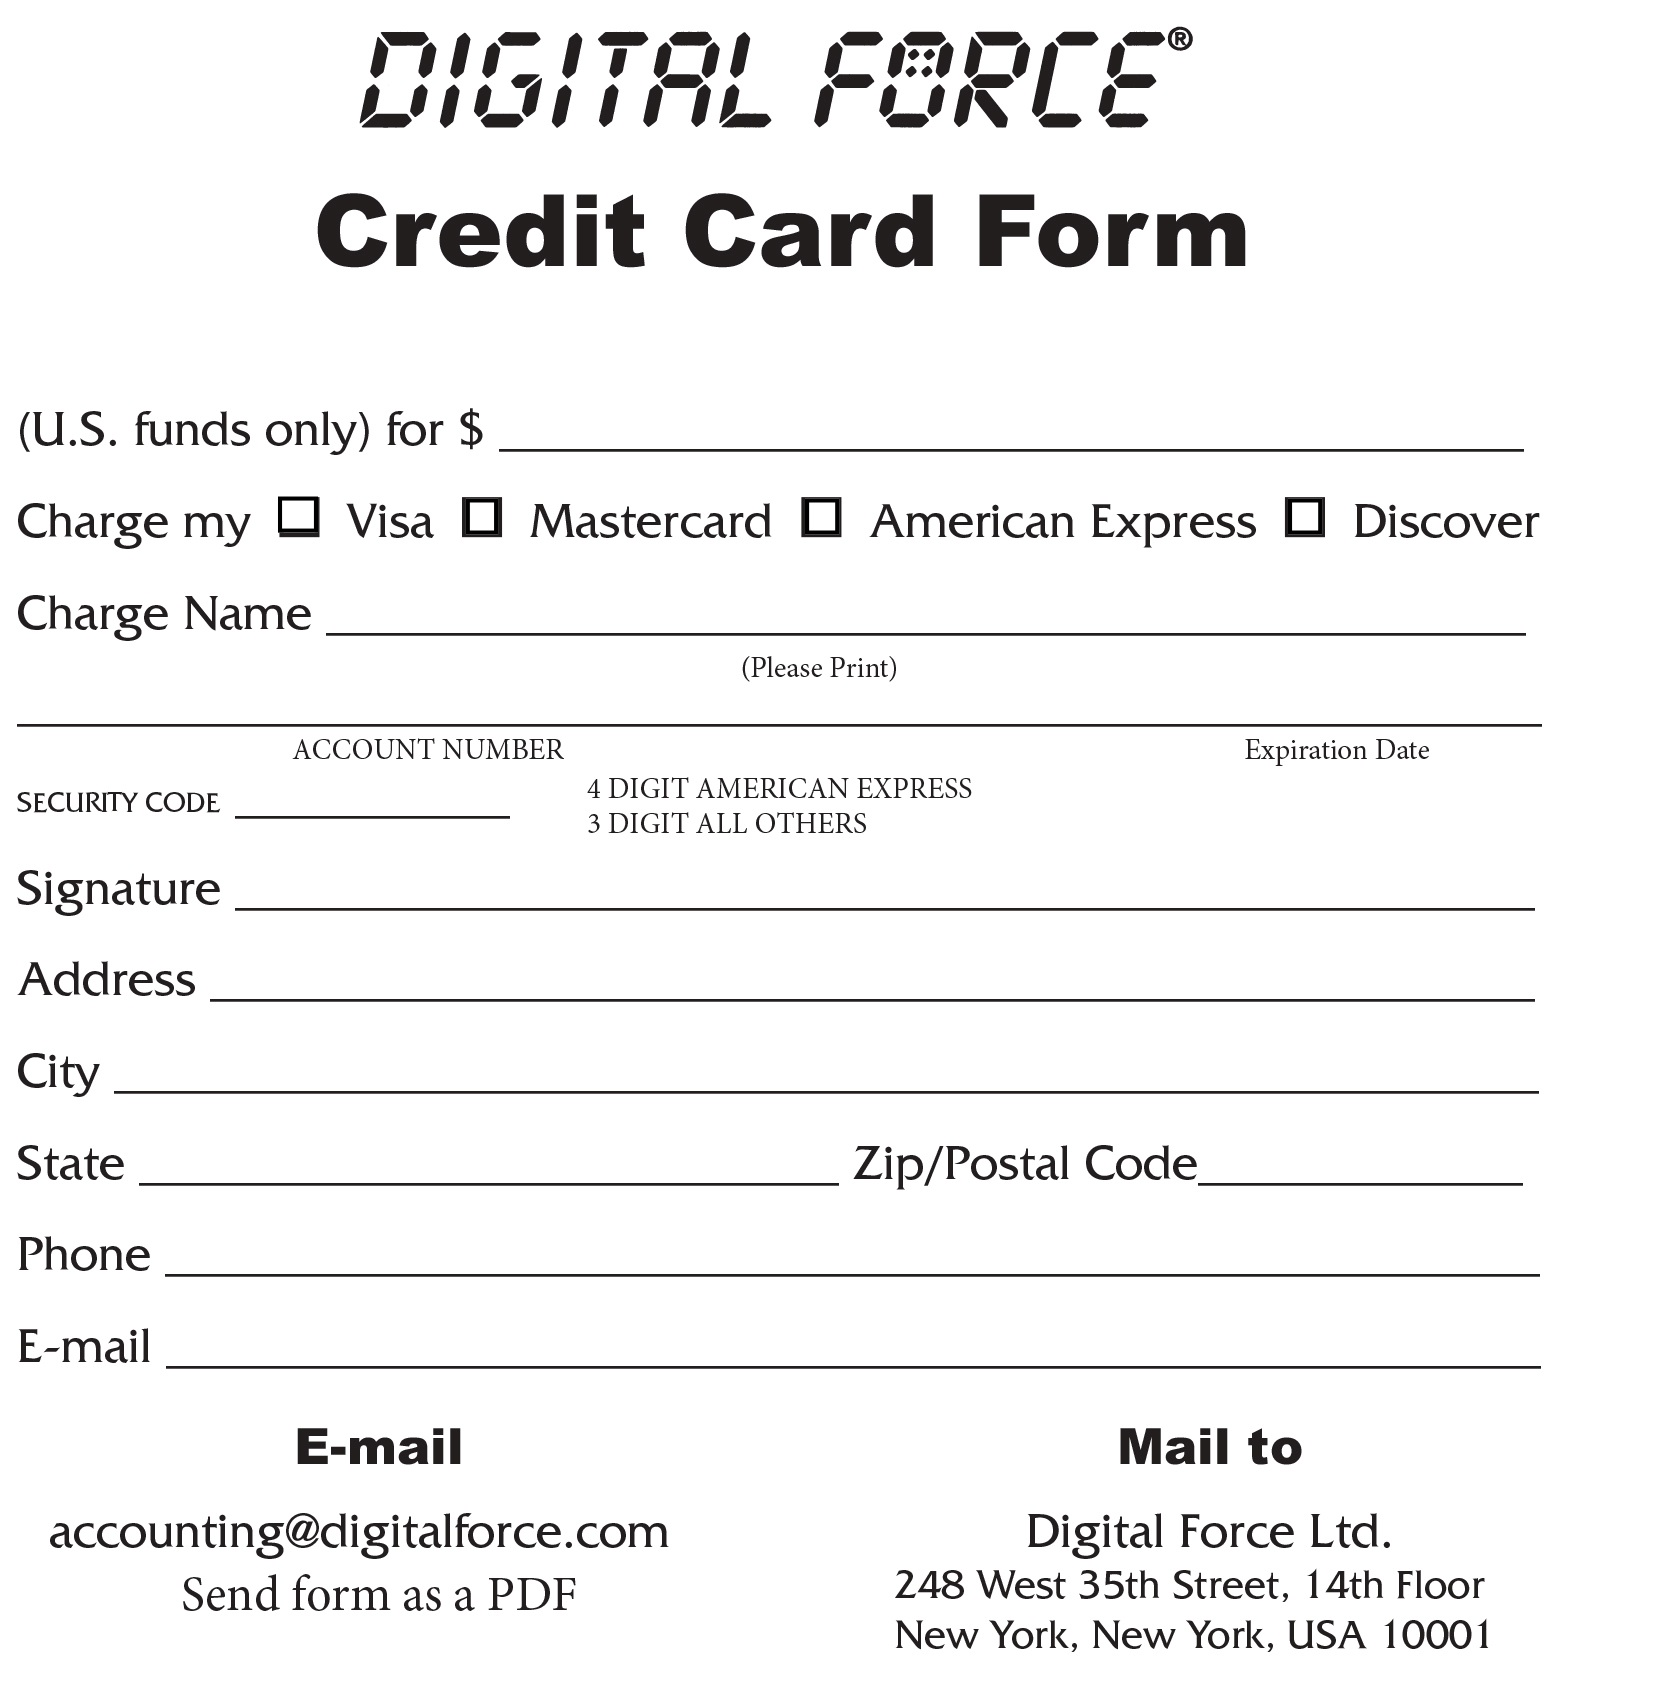 Credit Card OrderForm